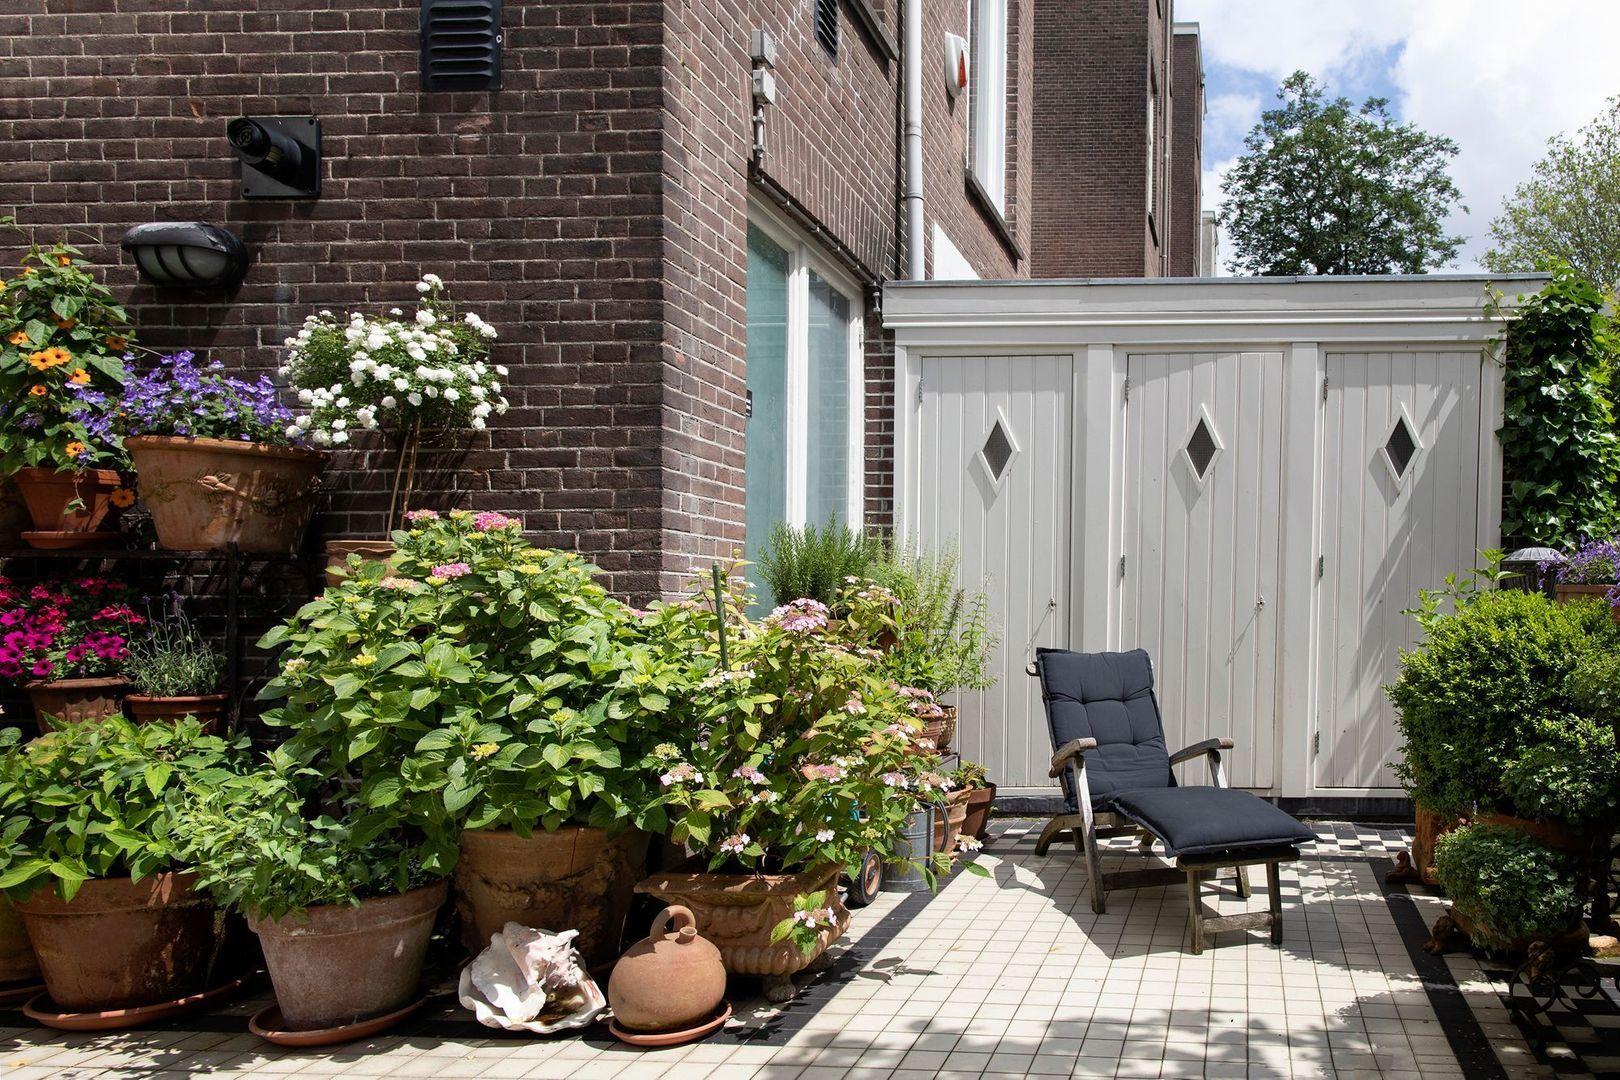 Vossiusstraat 32 /hs, Amsterdam foto-